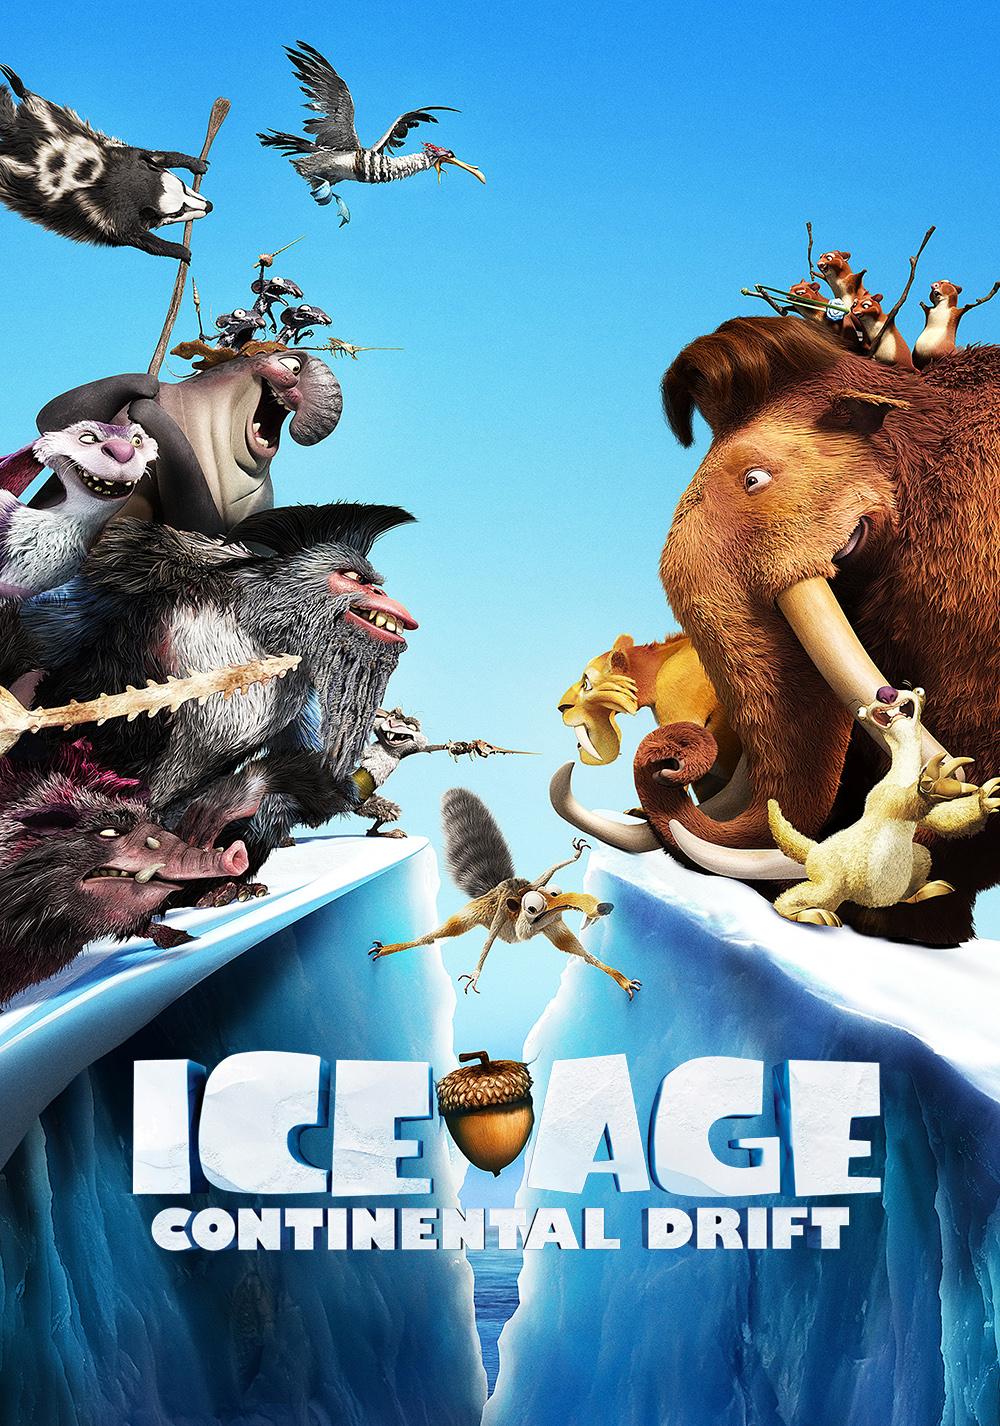 ice-age-continental-drift-52a87a871cca6.jpg